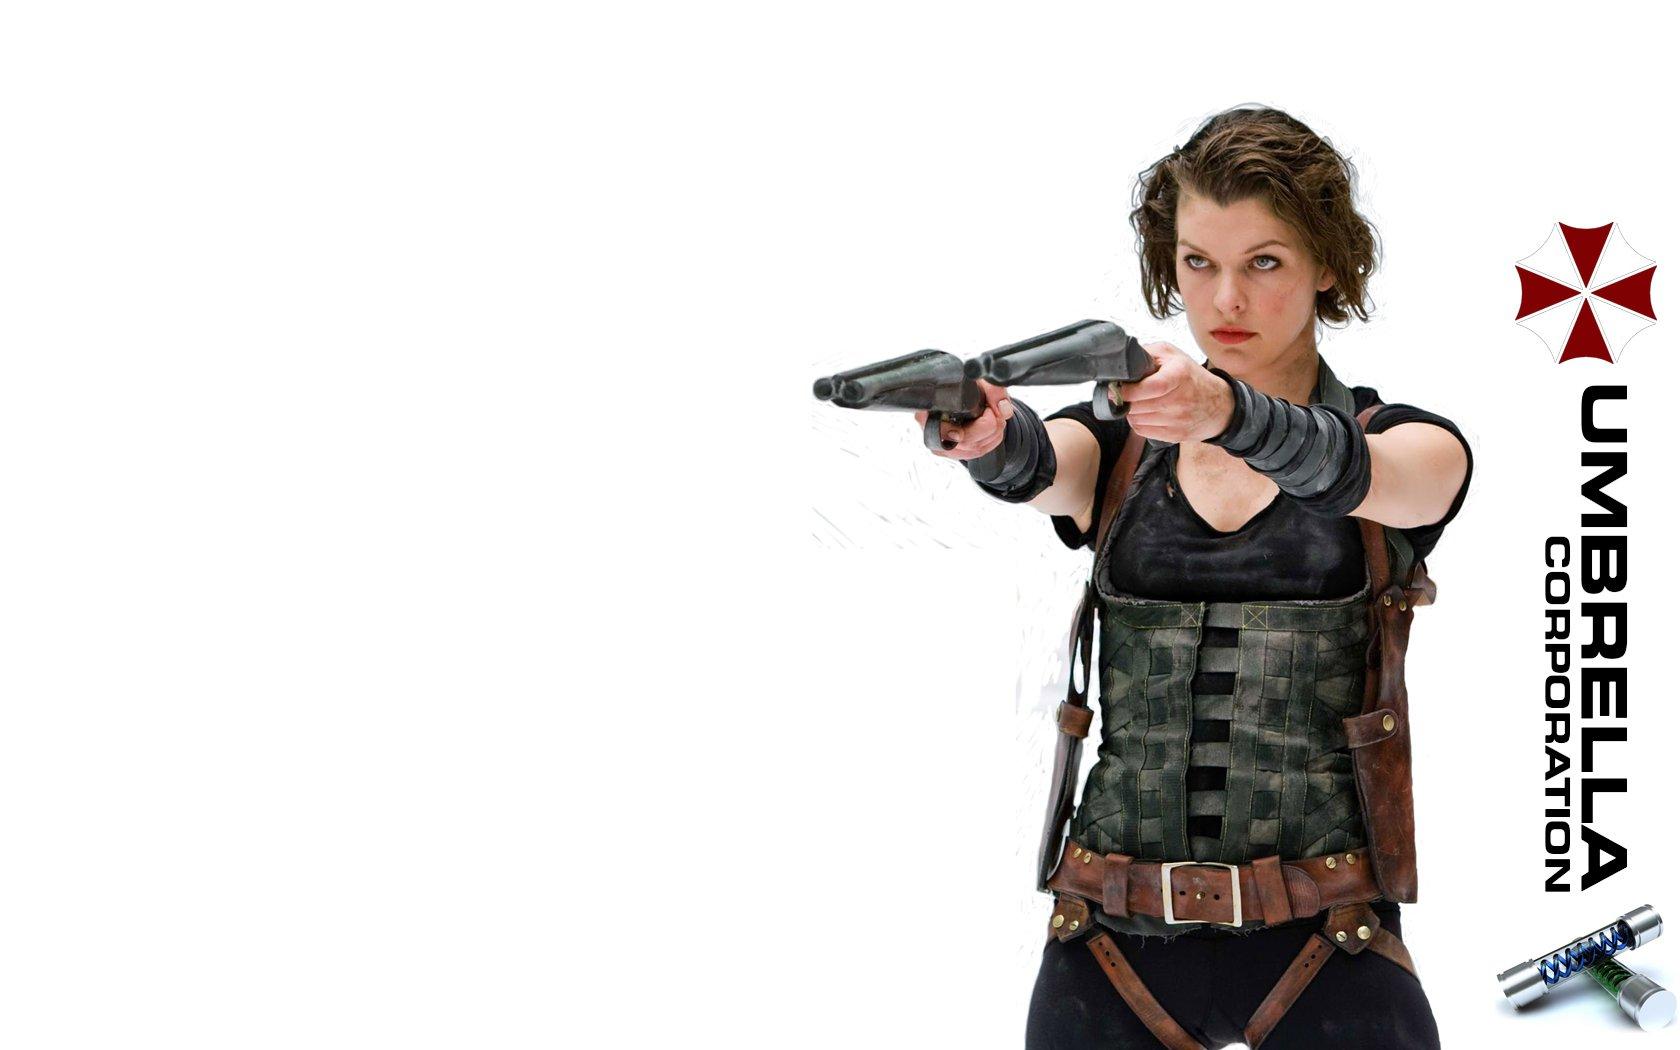 Milla Jovovich Resident Evil Wallpaper - WallpaperSafari